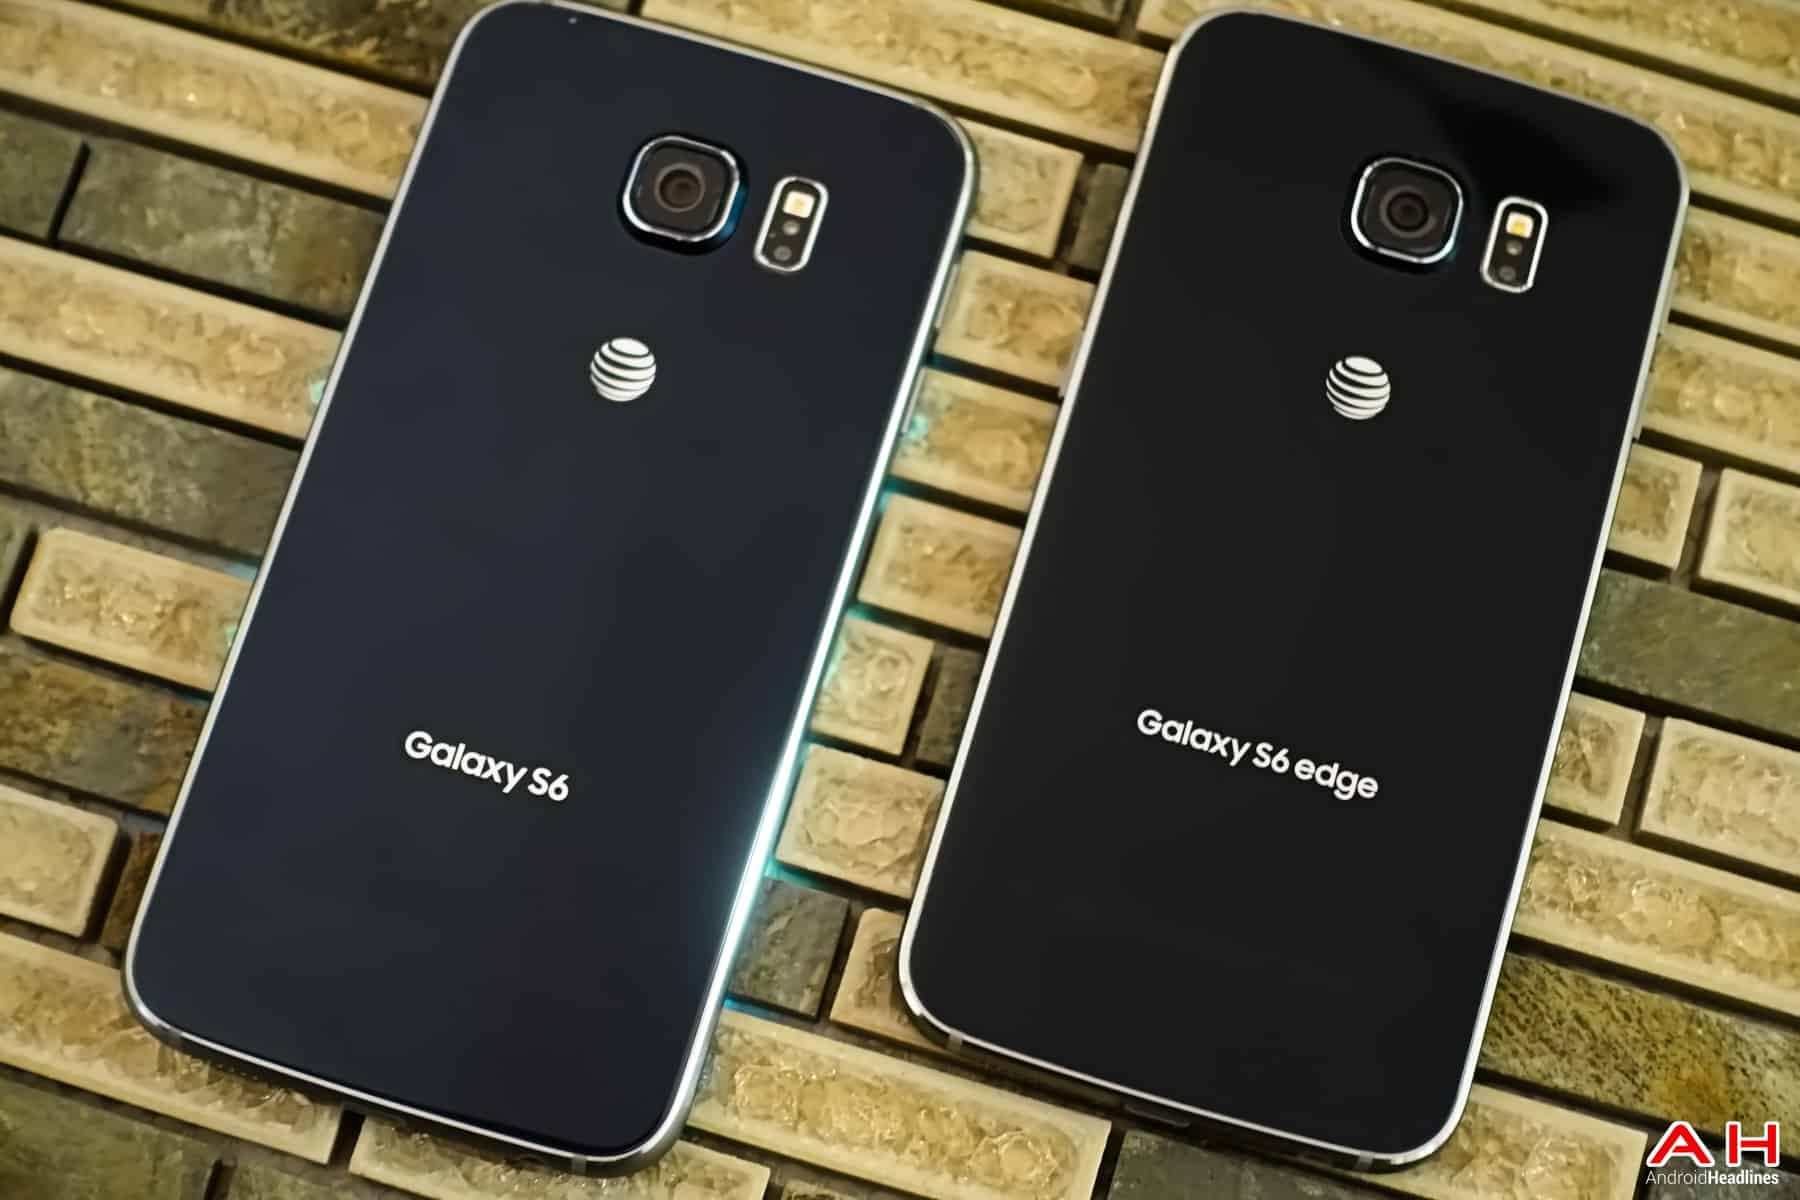 AH Samsung Galaxy S6 & Edge May 3rd - Chris-7